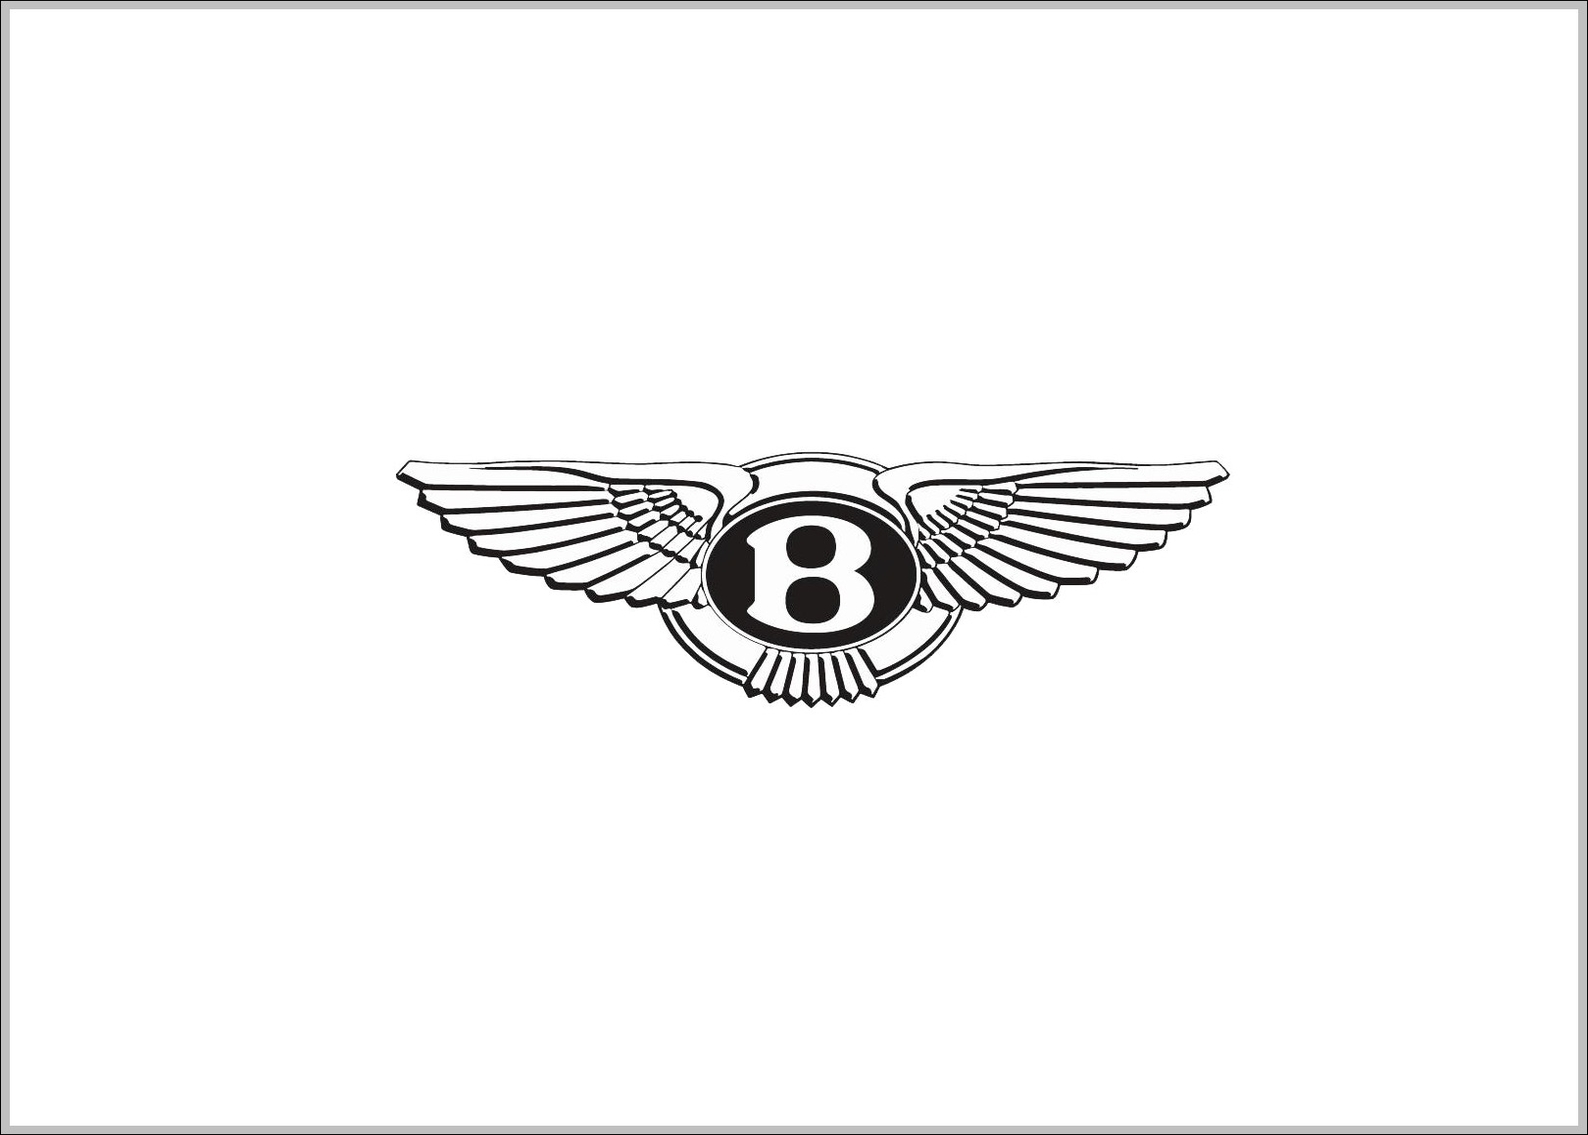 Bentley Wings Symbol Logo Sign Logos Signs Symbols - Car sign with wings